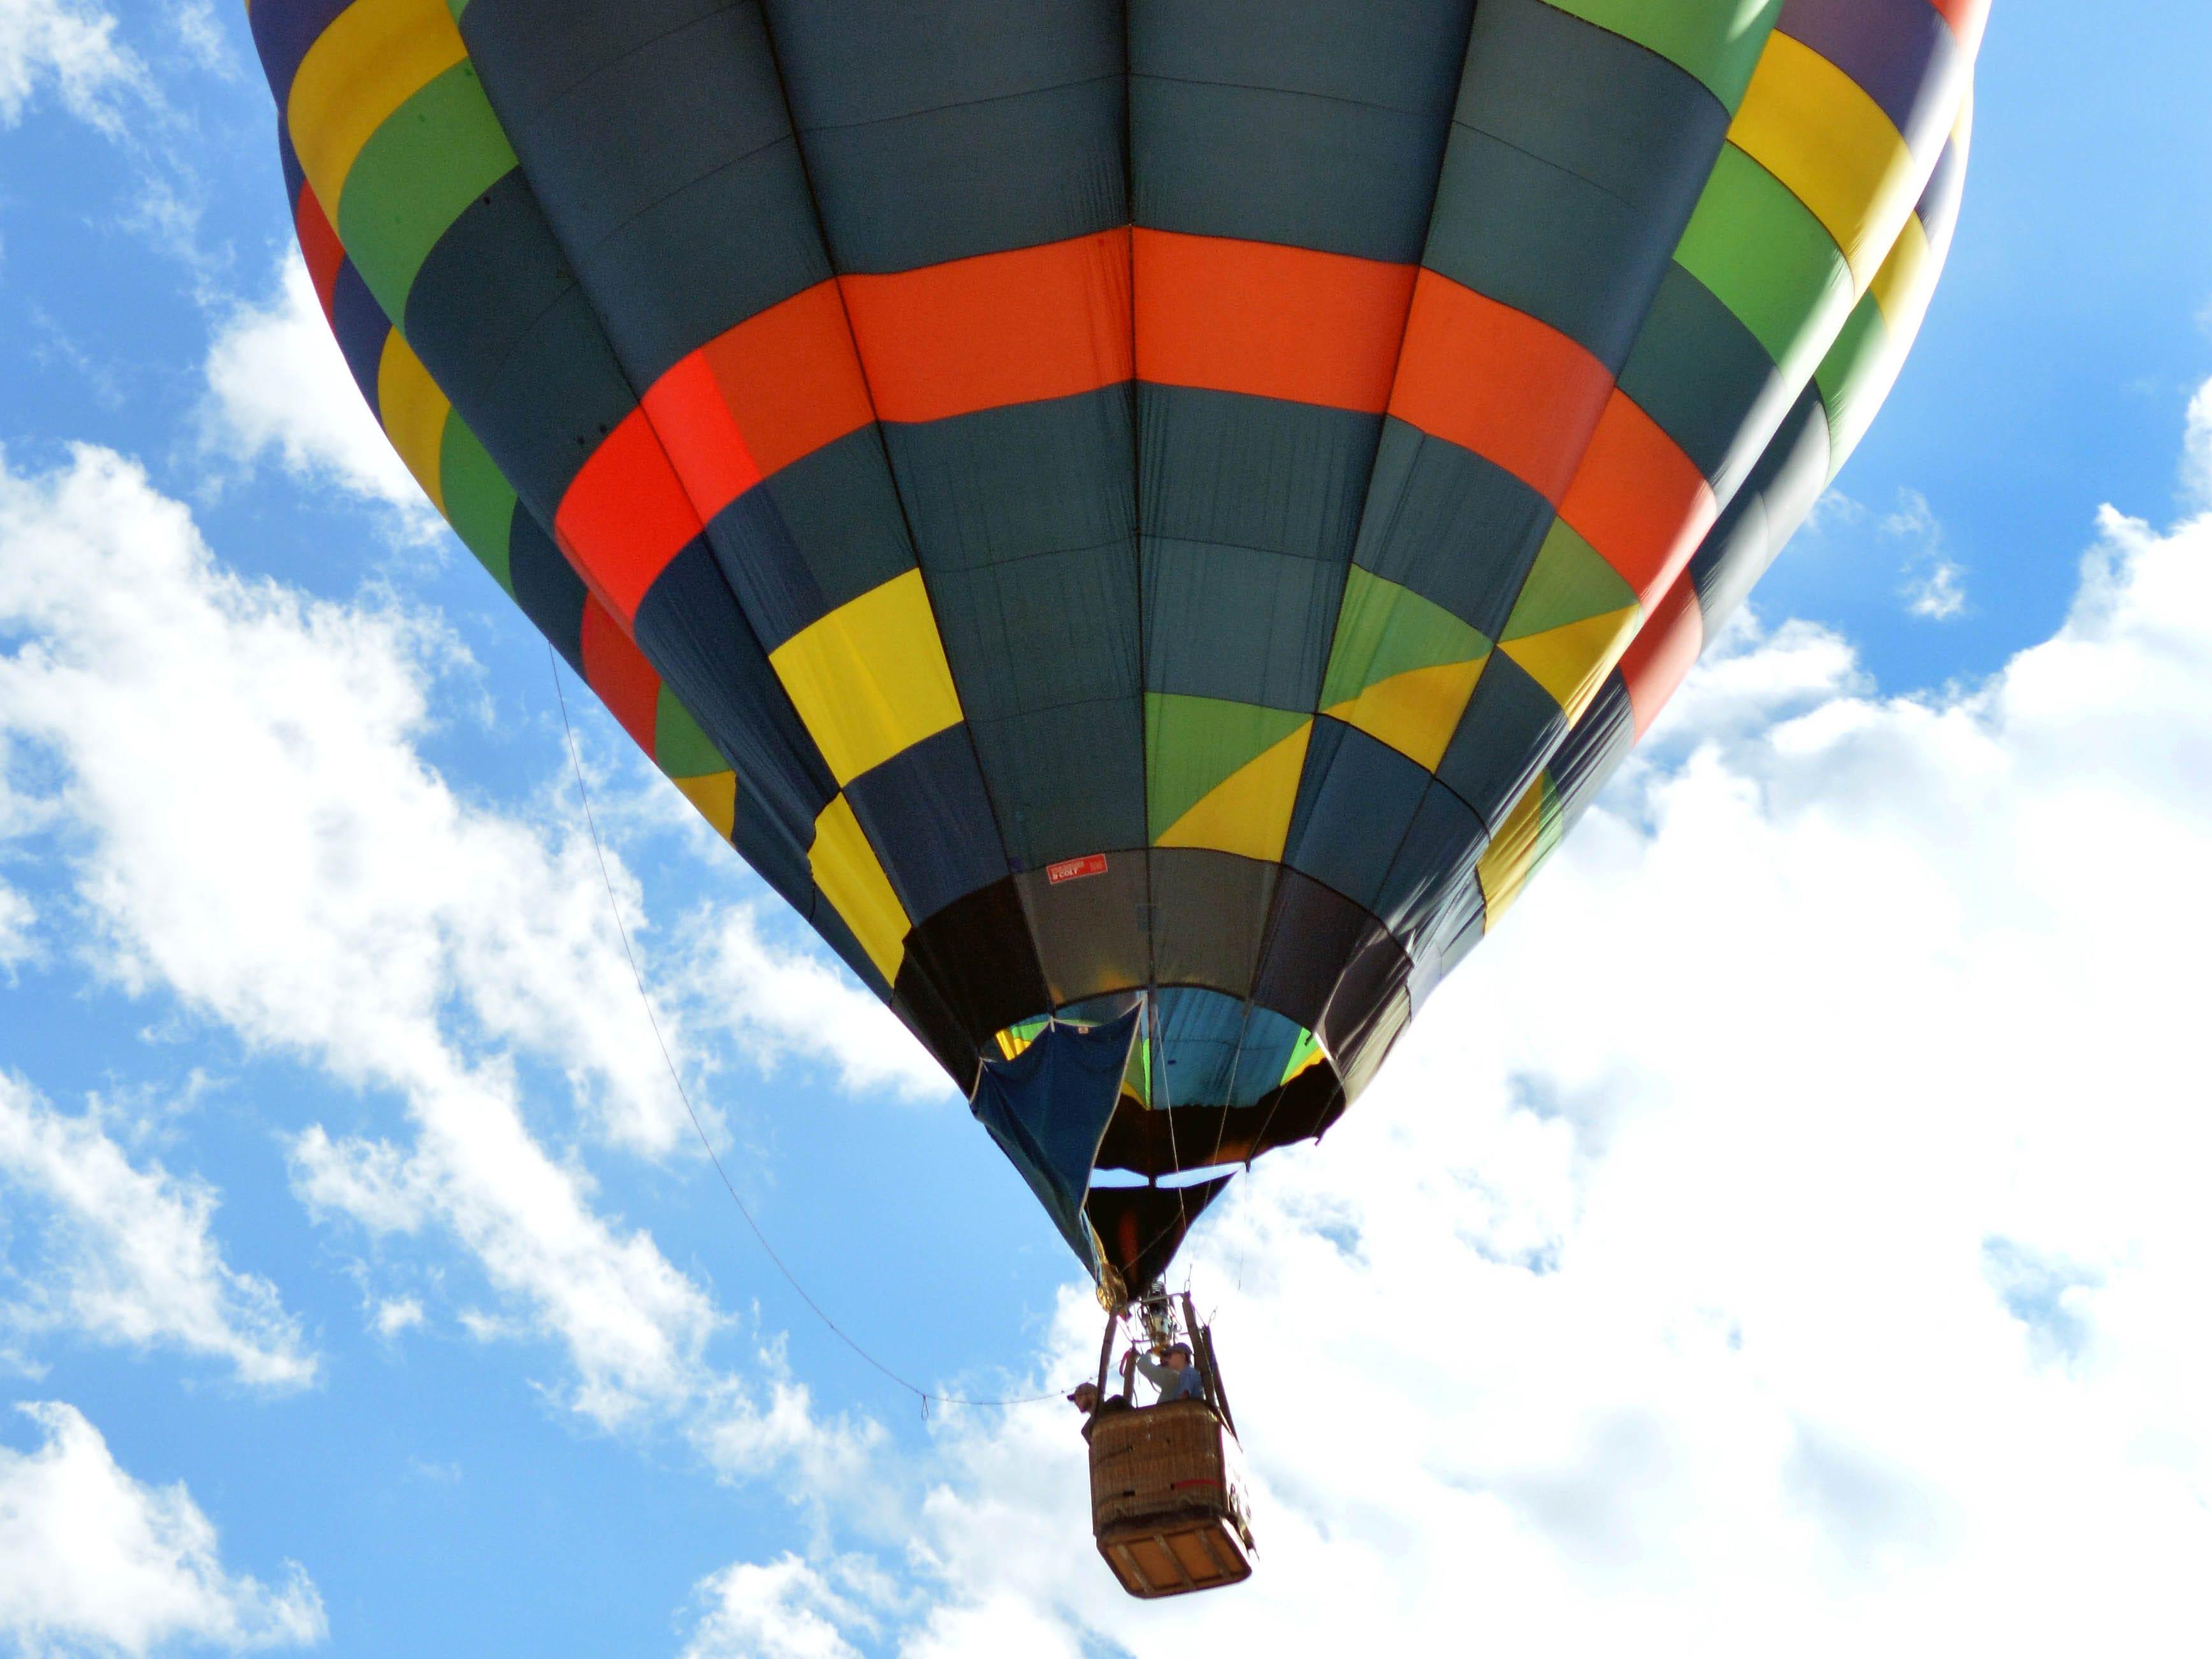 A hot air balloon takes flight Saturday, Sept. 15, 2018 at the White Sands Balloon Invitational.